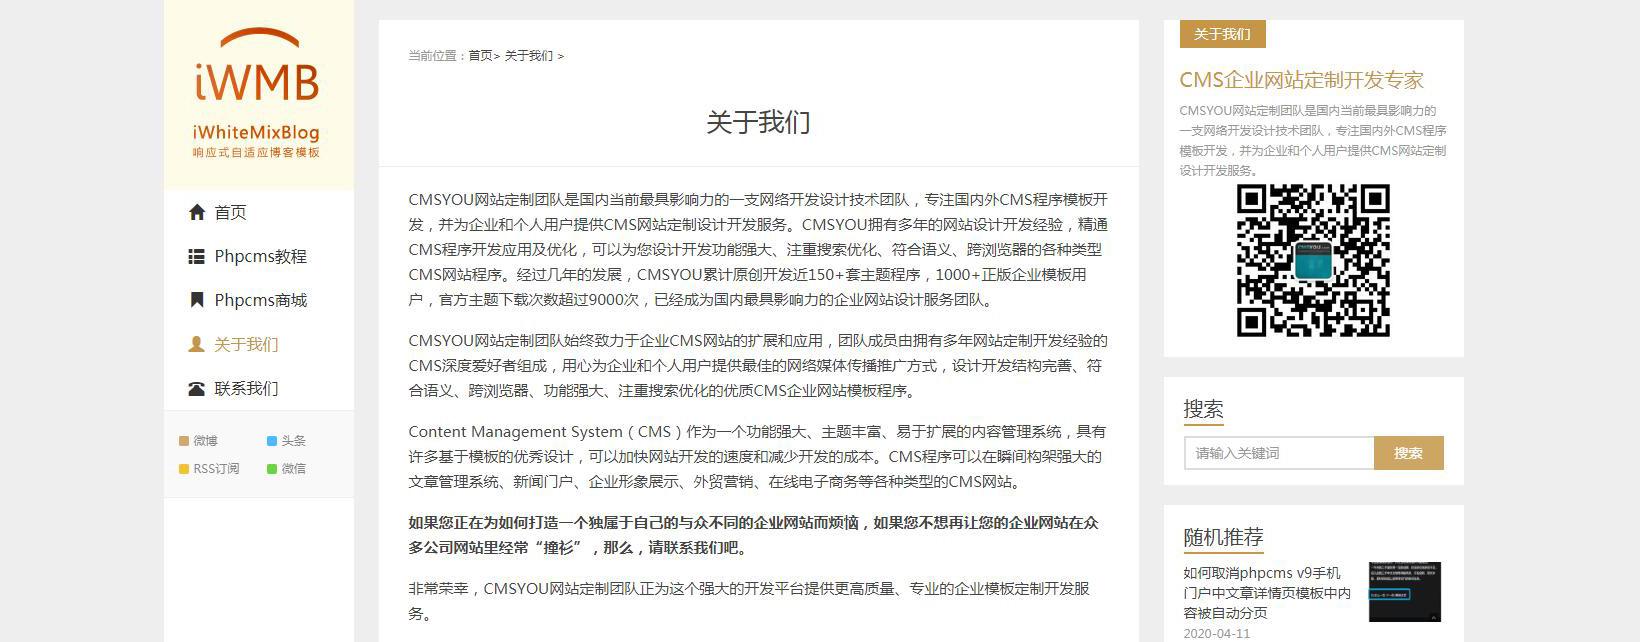 iWhiteMixBlog白色简洁响应式博客网站模板